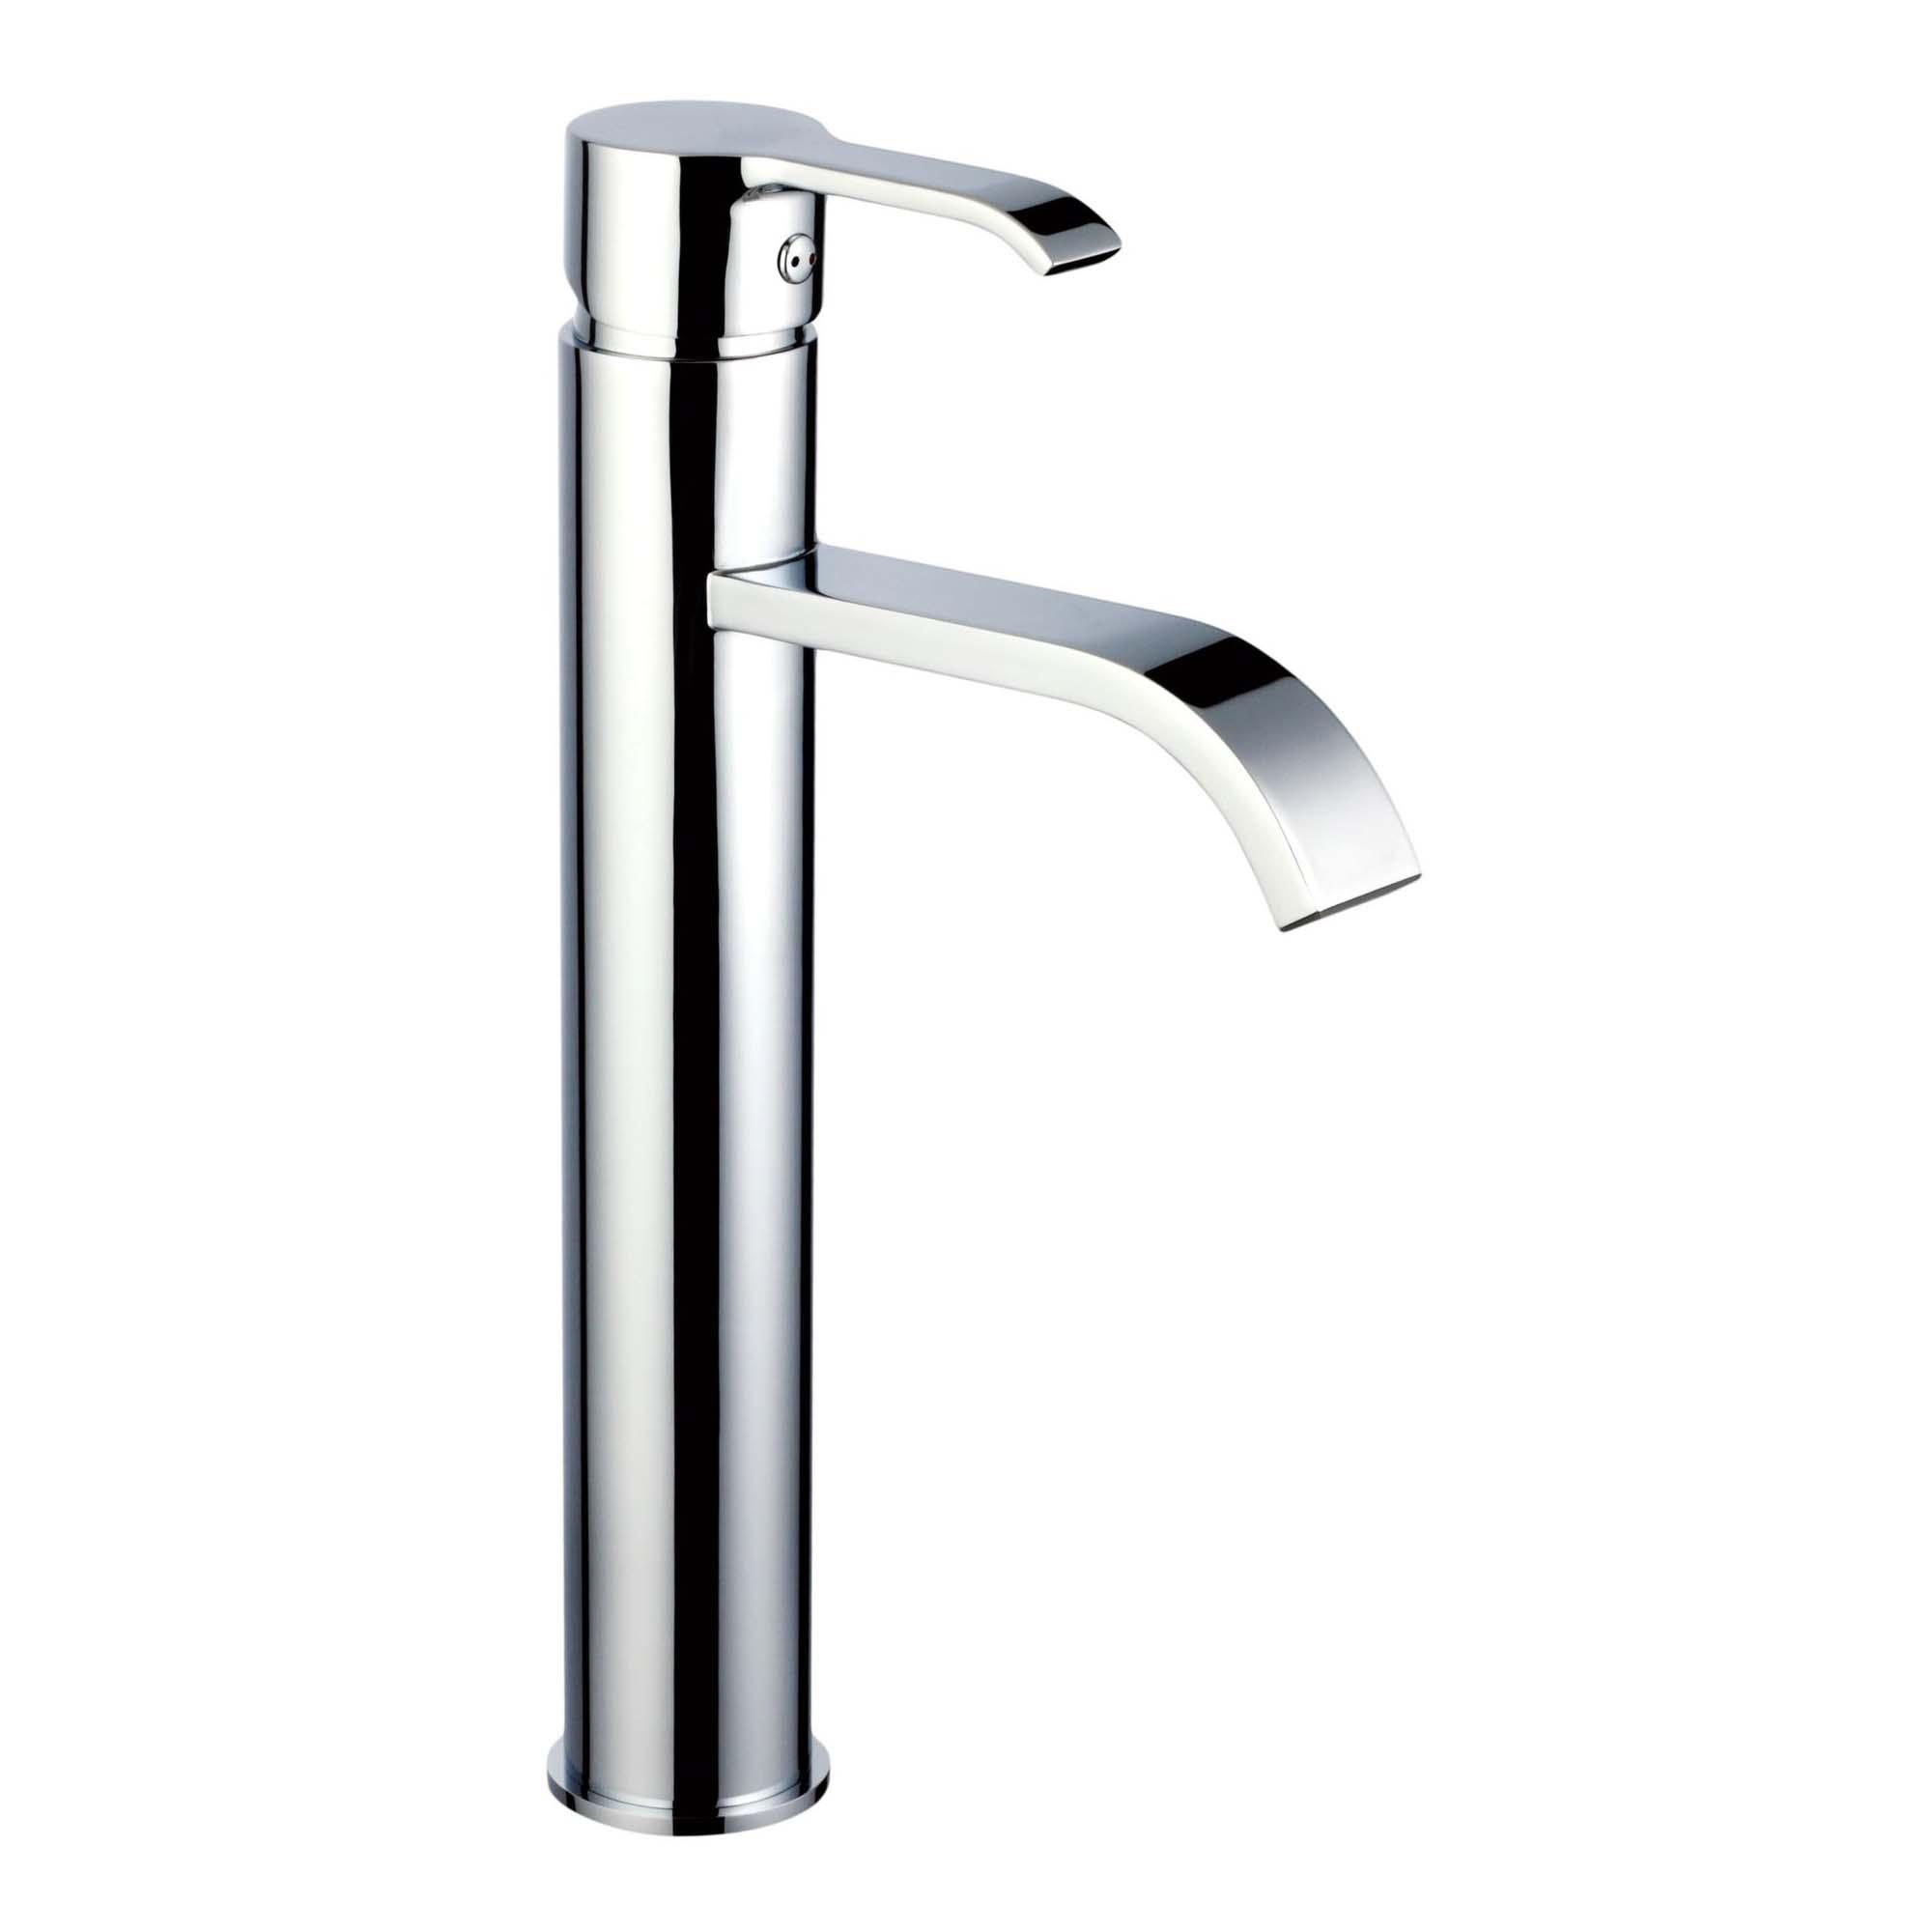 Grifo lavabo caiman 310202 ref 98186 grifer a clever for Grifo lavabo